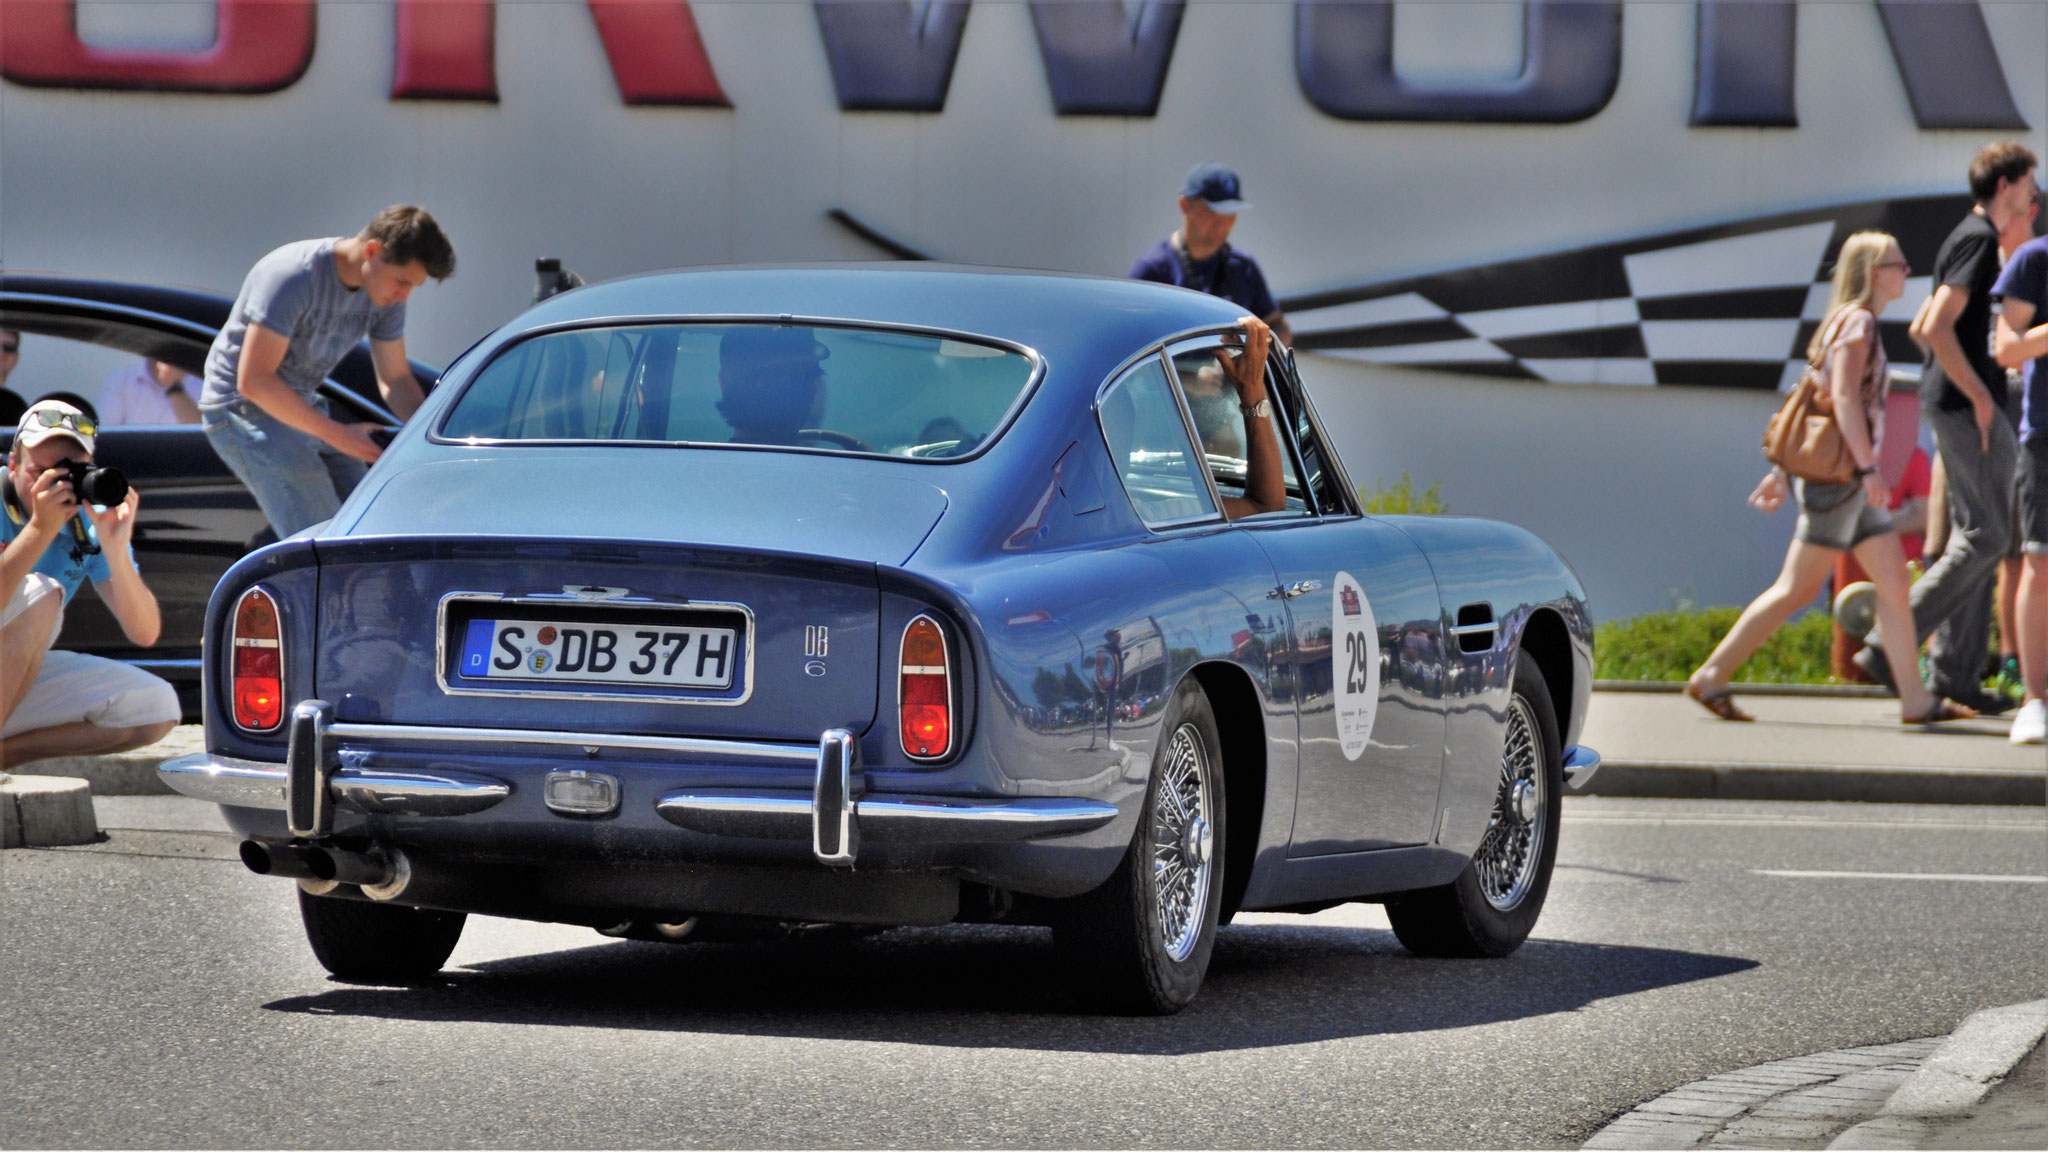 Aston Martin DB6 - S-DB-37H